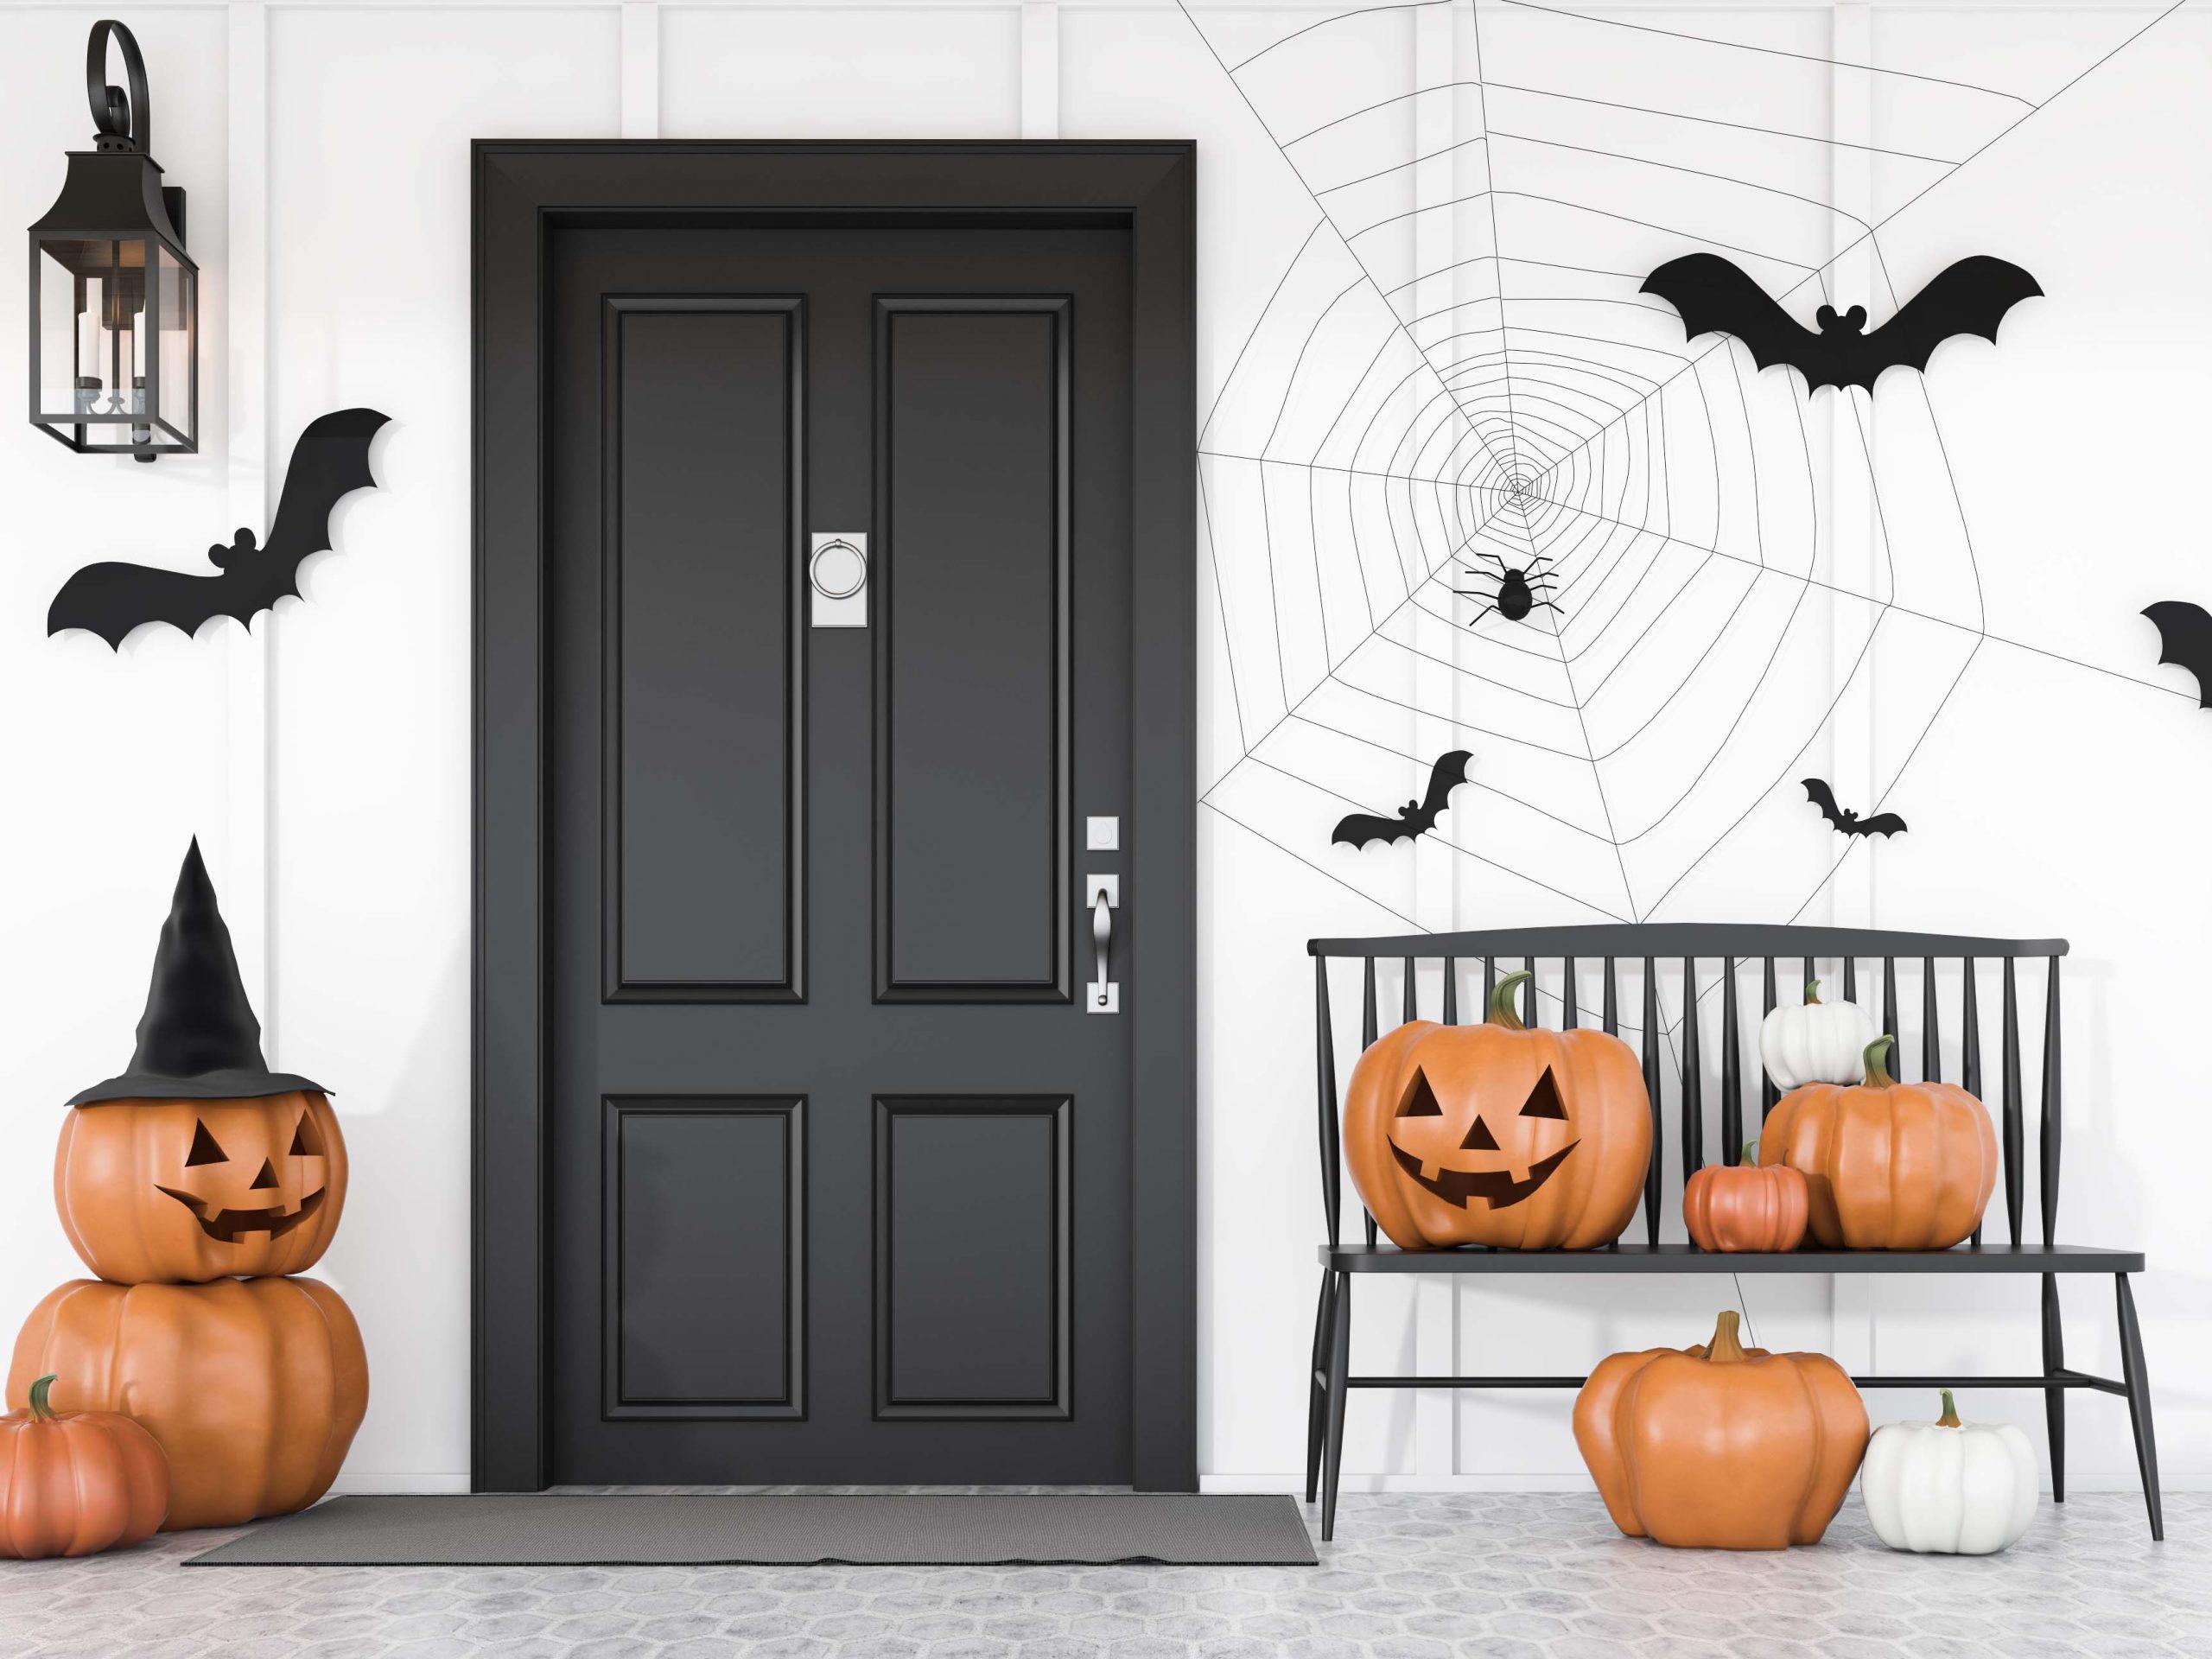 Carved pumpkins near black house door